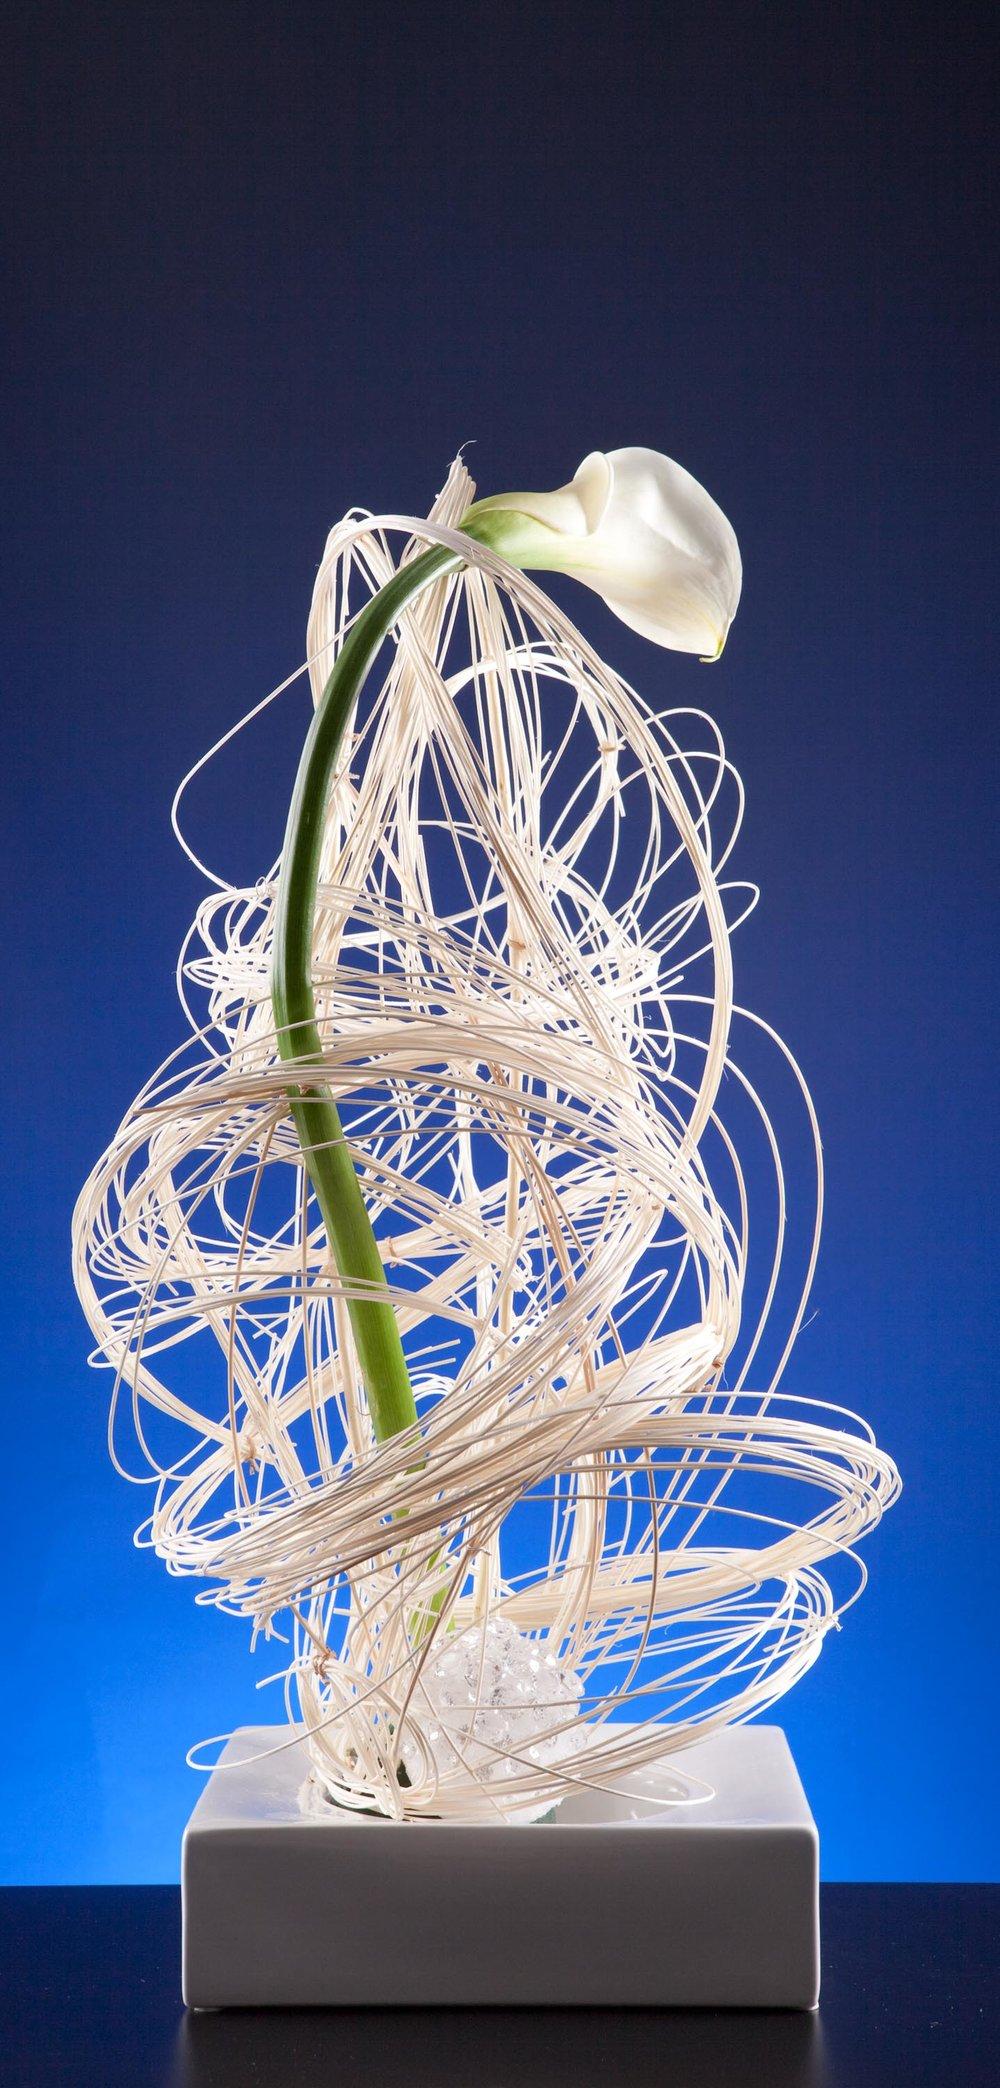 Creative design by Hitomi Gilliam AIFD